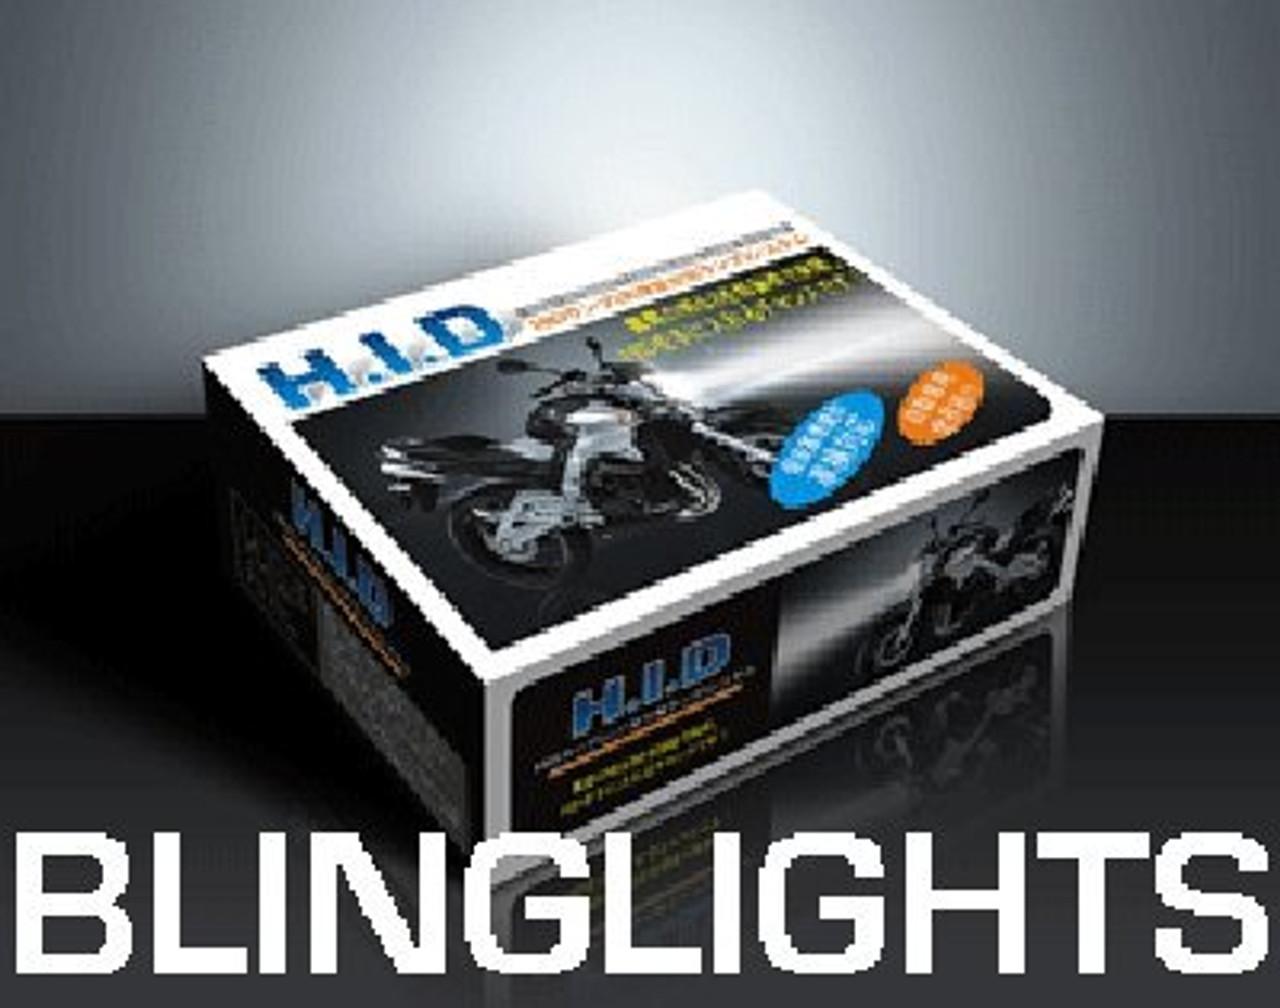 1993-2009 HARLEY-DAVIDSON SPRINGER SOFTTAIL HID HEAD LIGHT 2001 2002 2003 2004 2005 2006 2007 2008